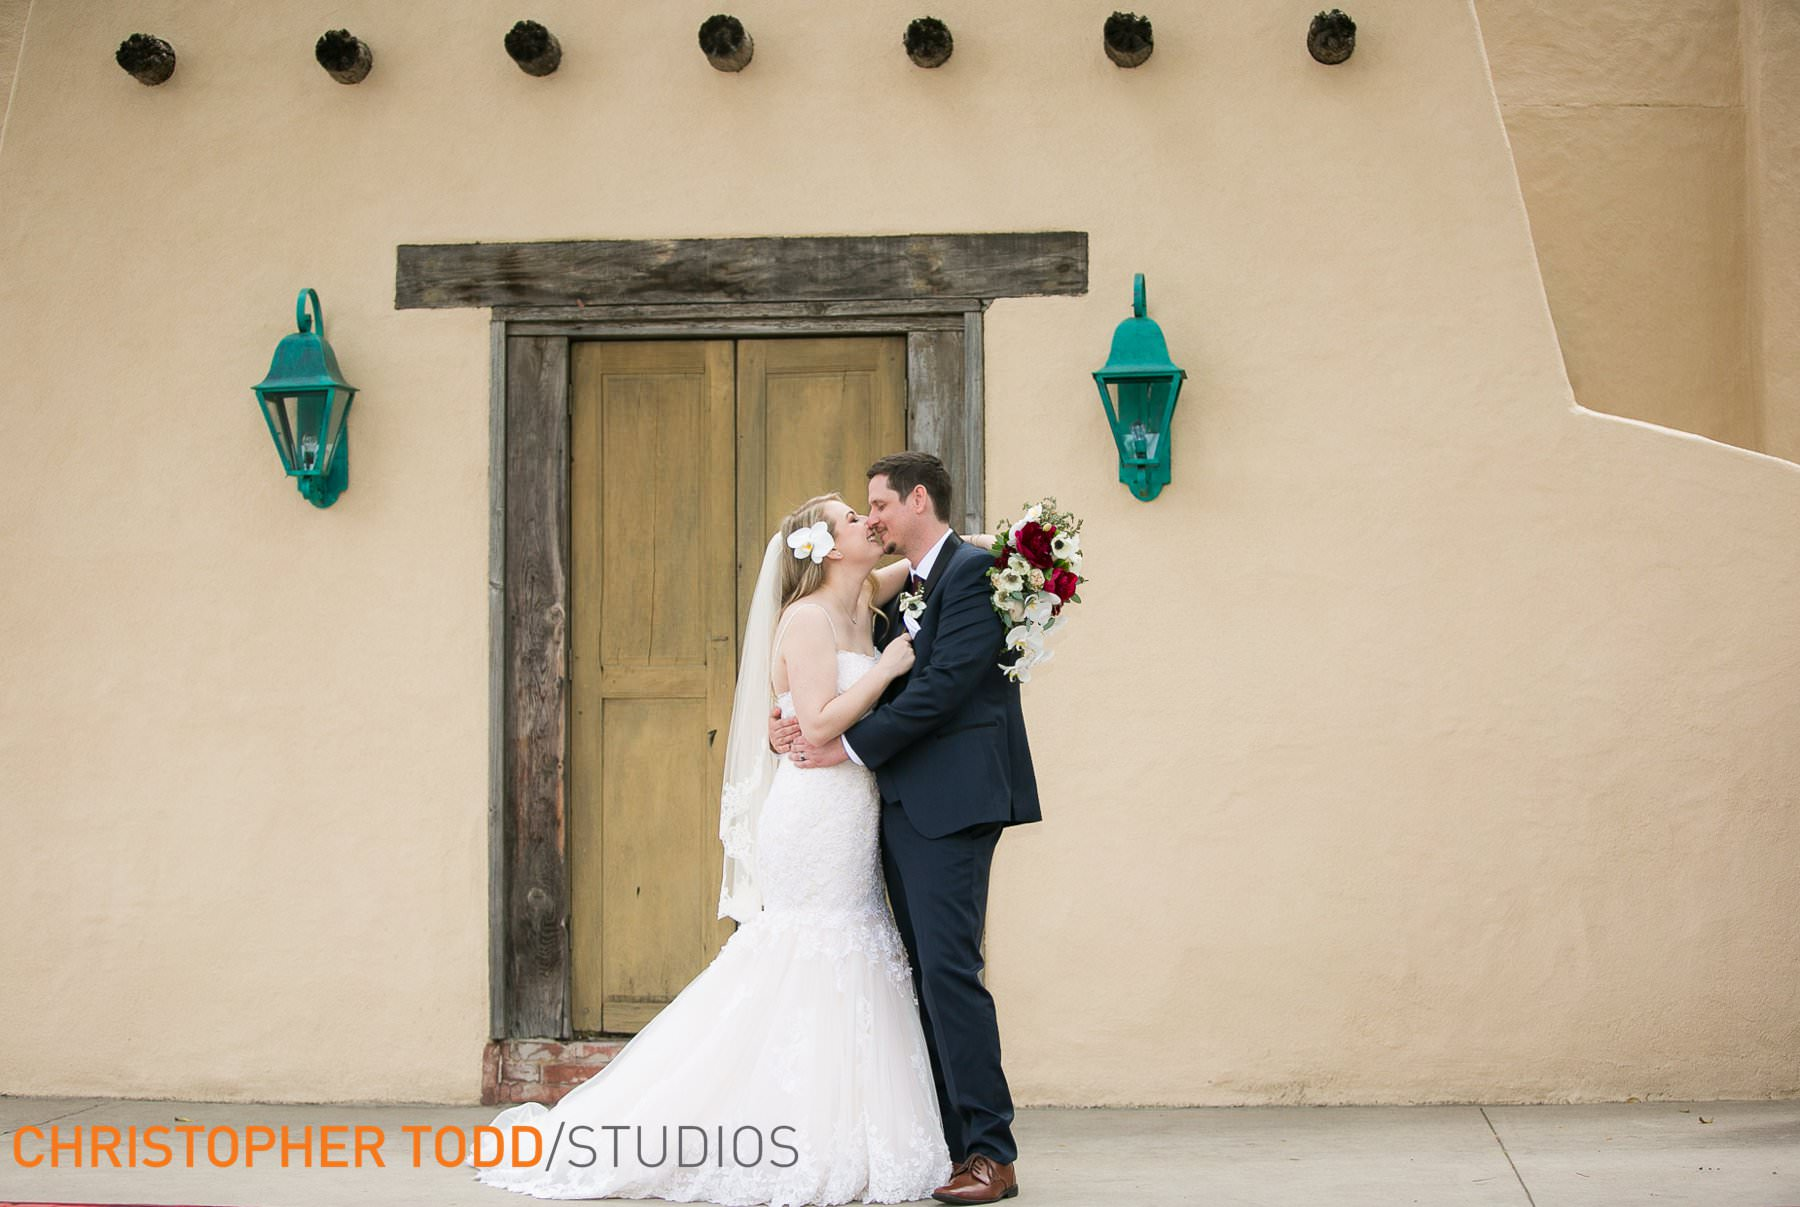 wedding-photography-at-the-hacienda-orange-county